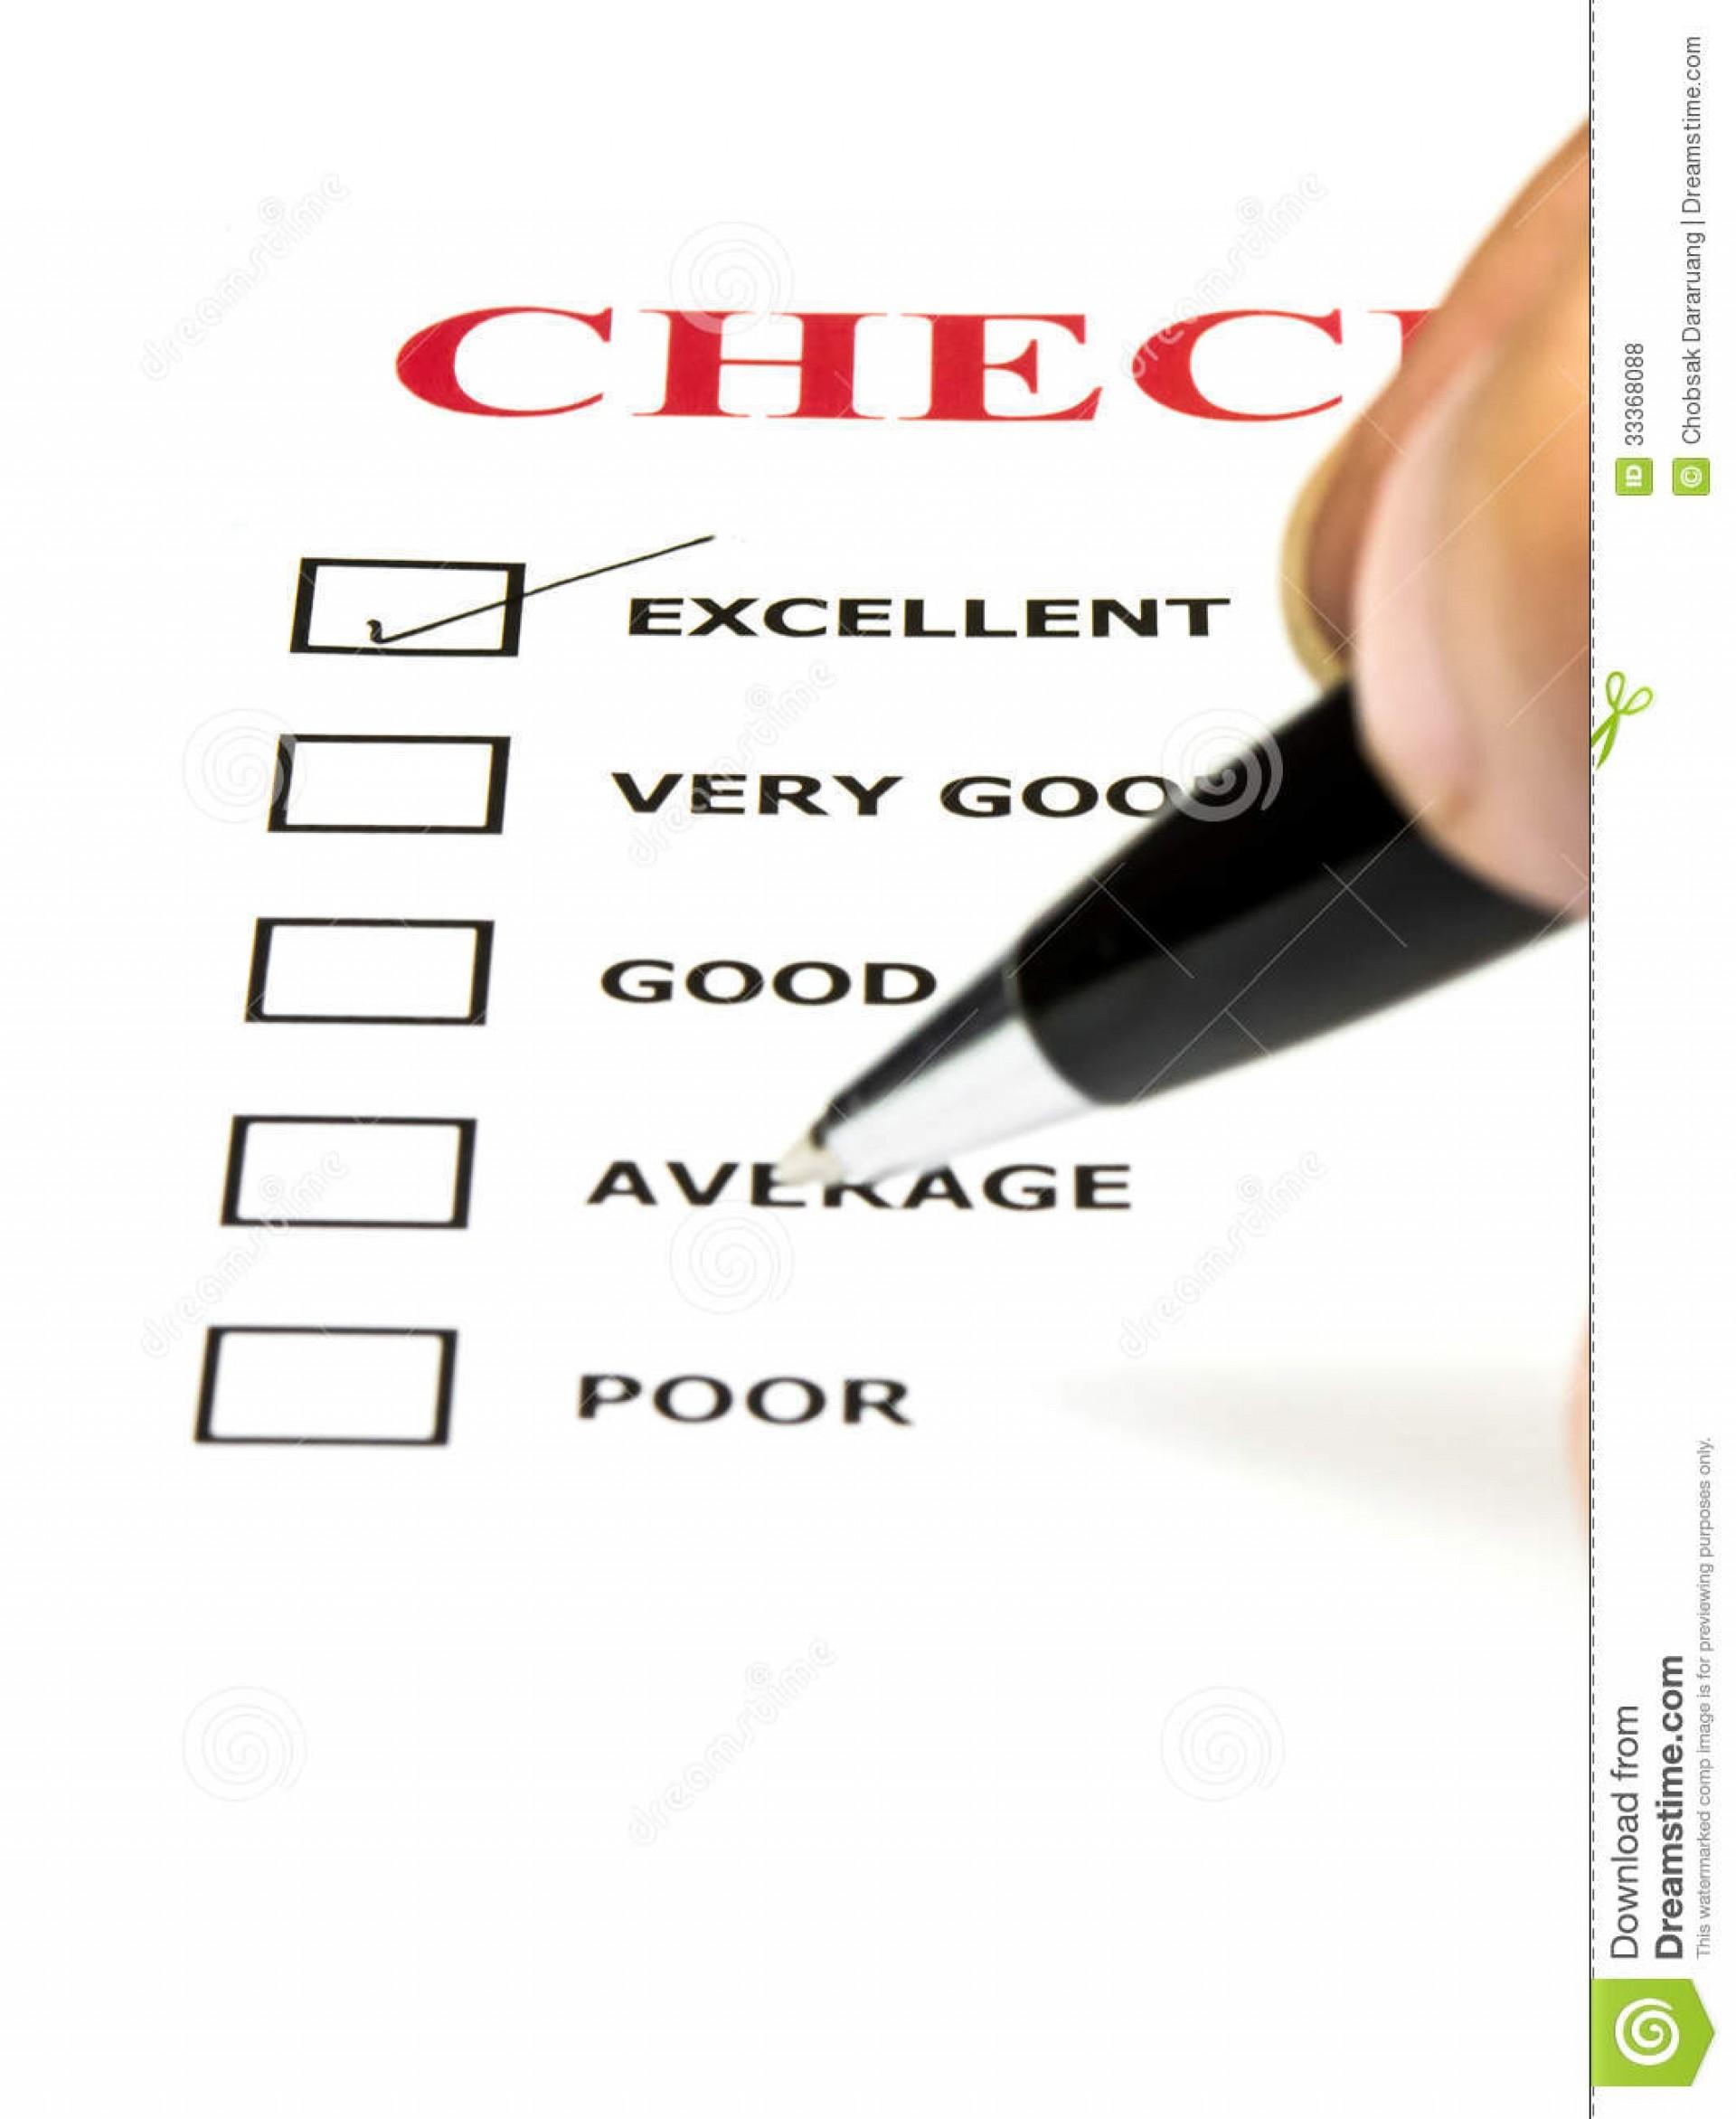 002 Essay Example Check List Survay Paper Close Up Angled Shot Survey Form Tick Excellent Box Customer Service Unique Checking Services Persuasive Checklist Pdf Checker Grammar Punctuation Free 1920